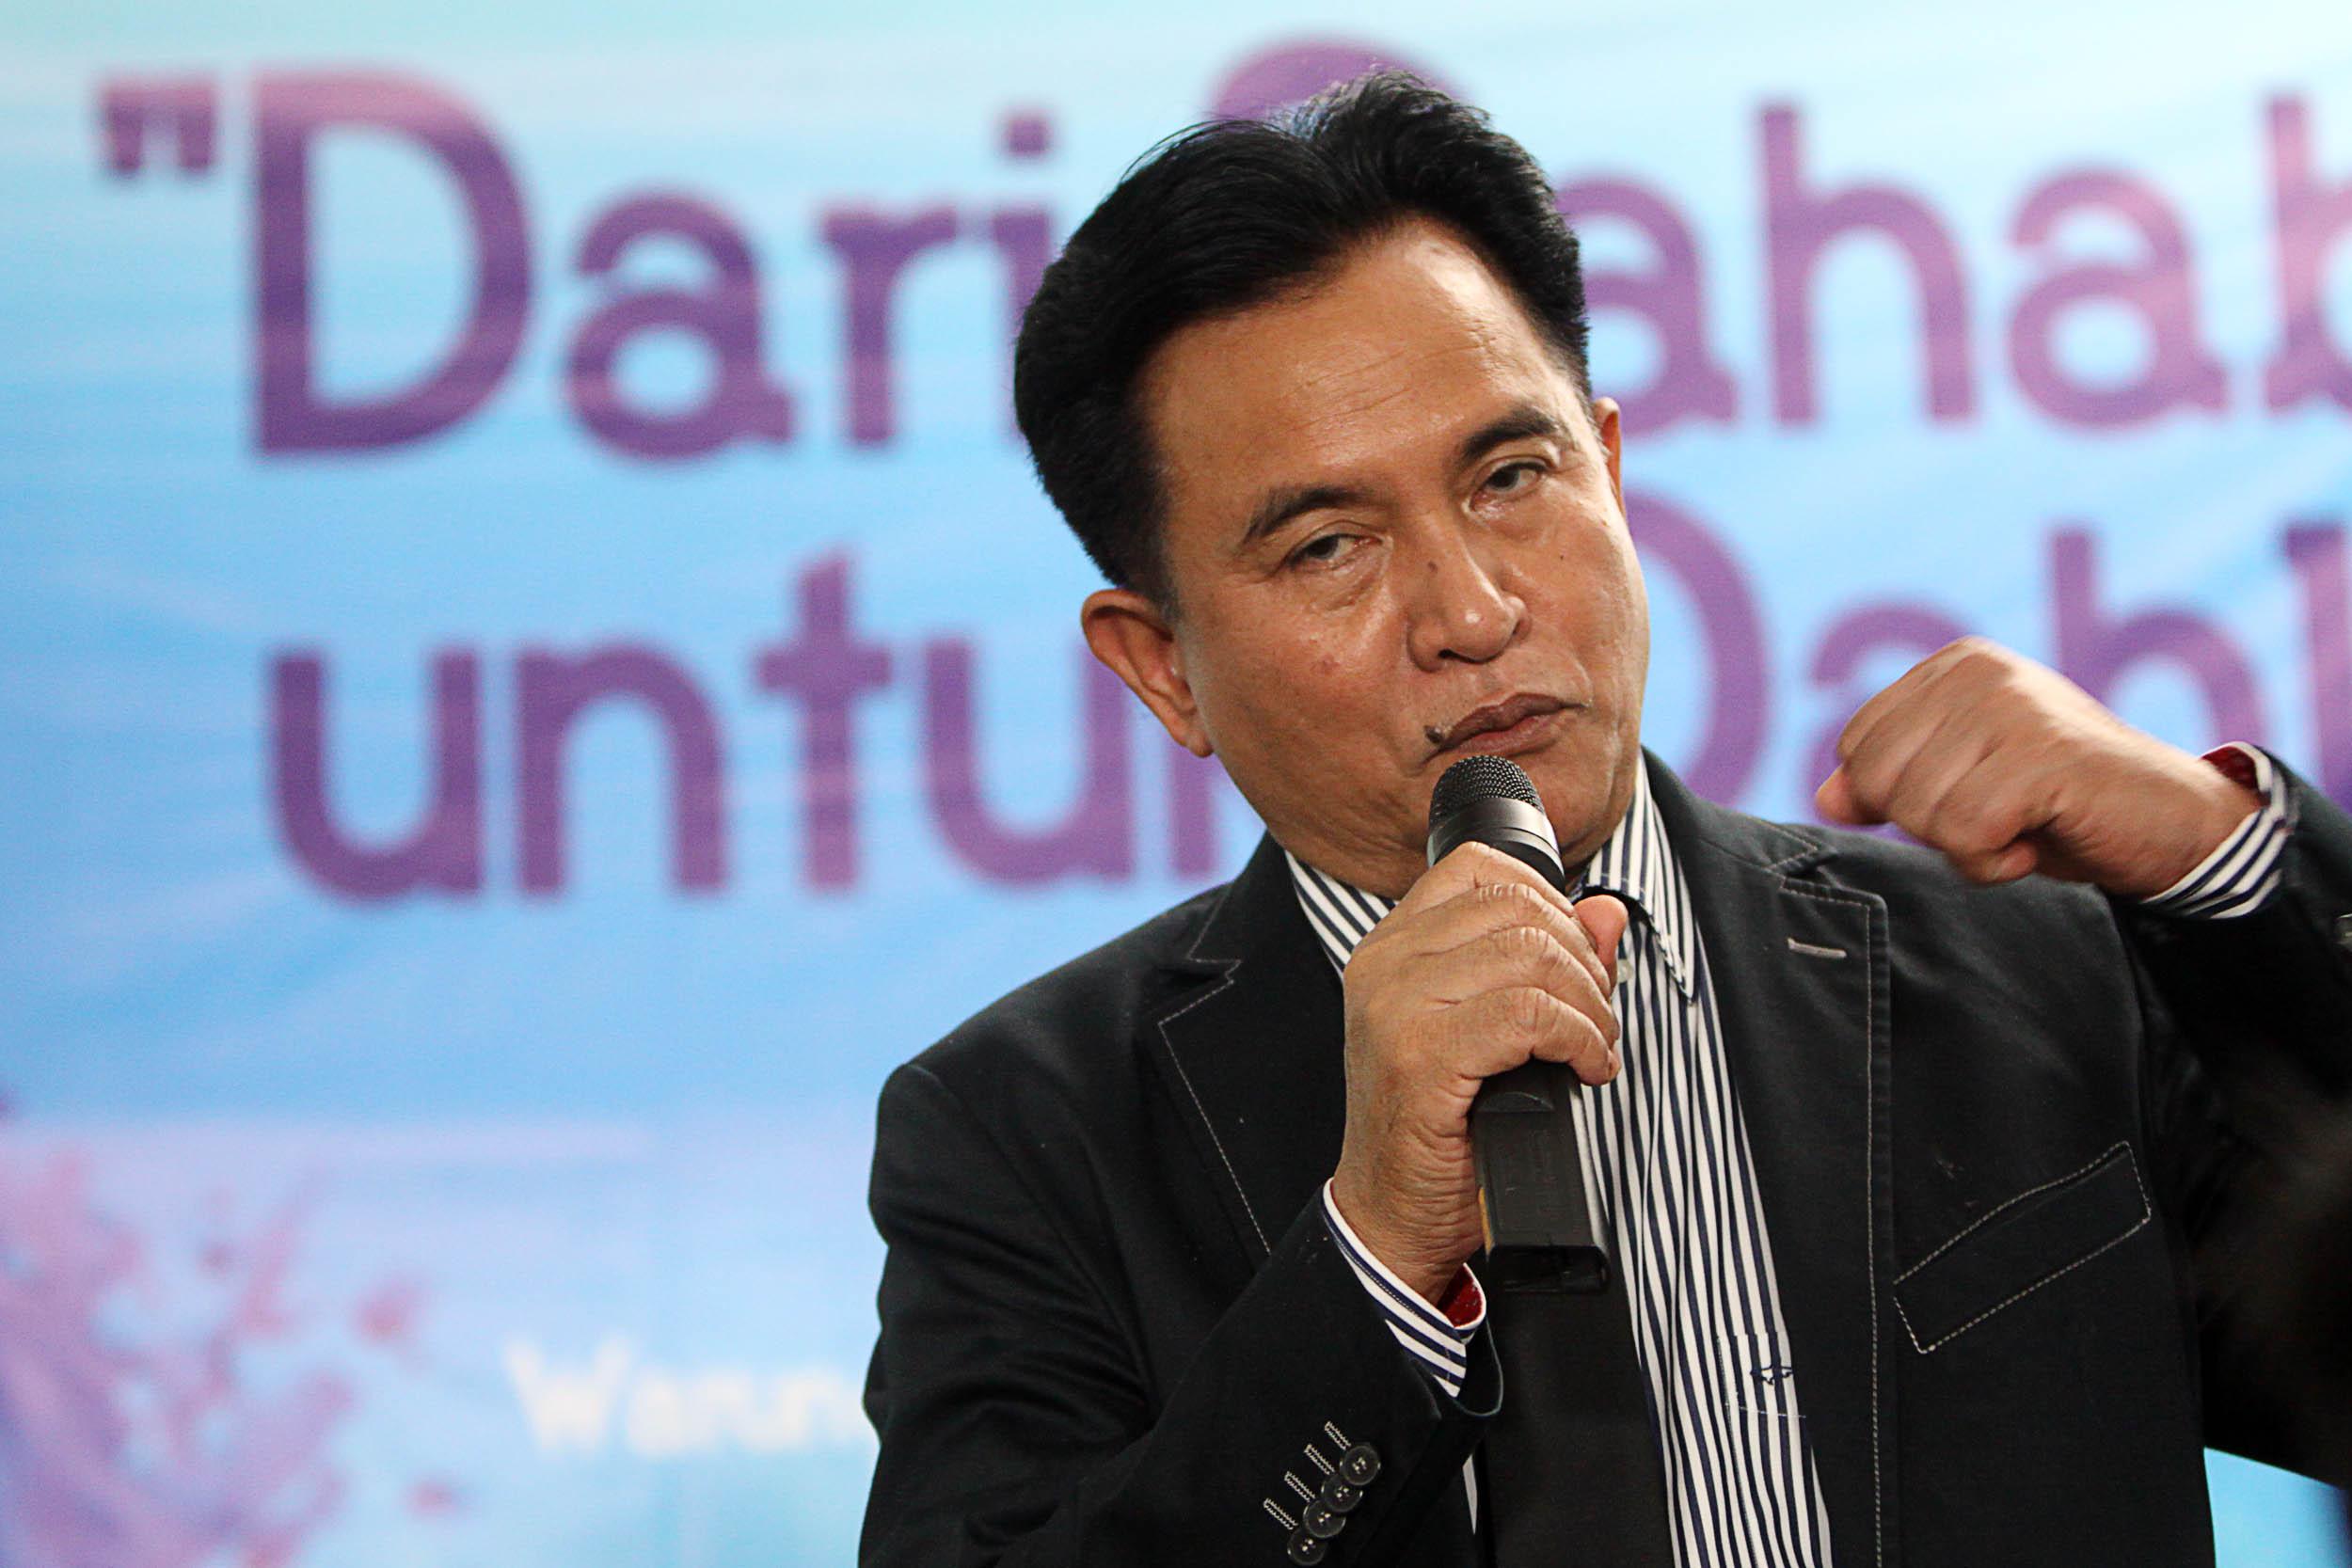 Pembatalan HGB Pulau Reklamasi Jangan karena Janji Kampanye